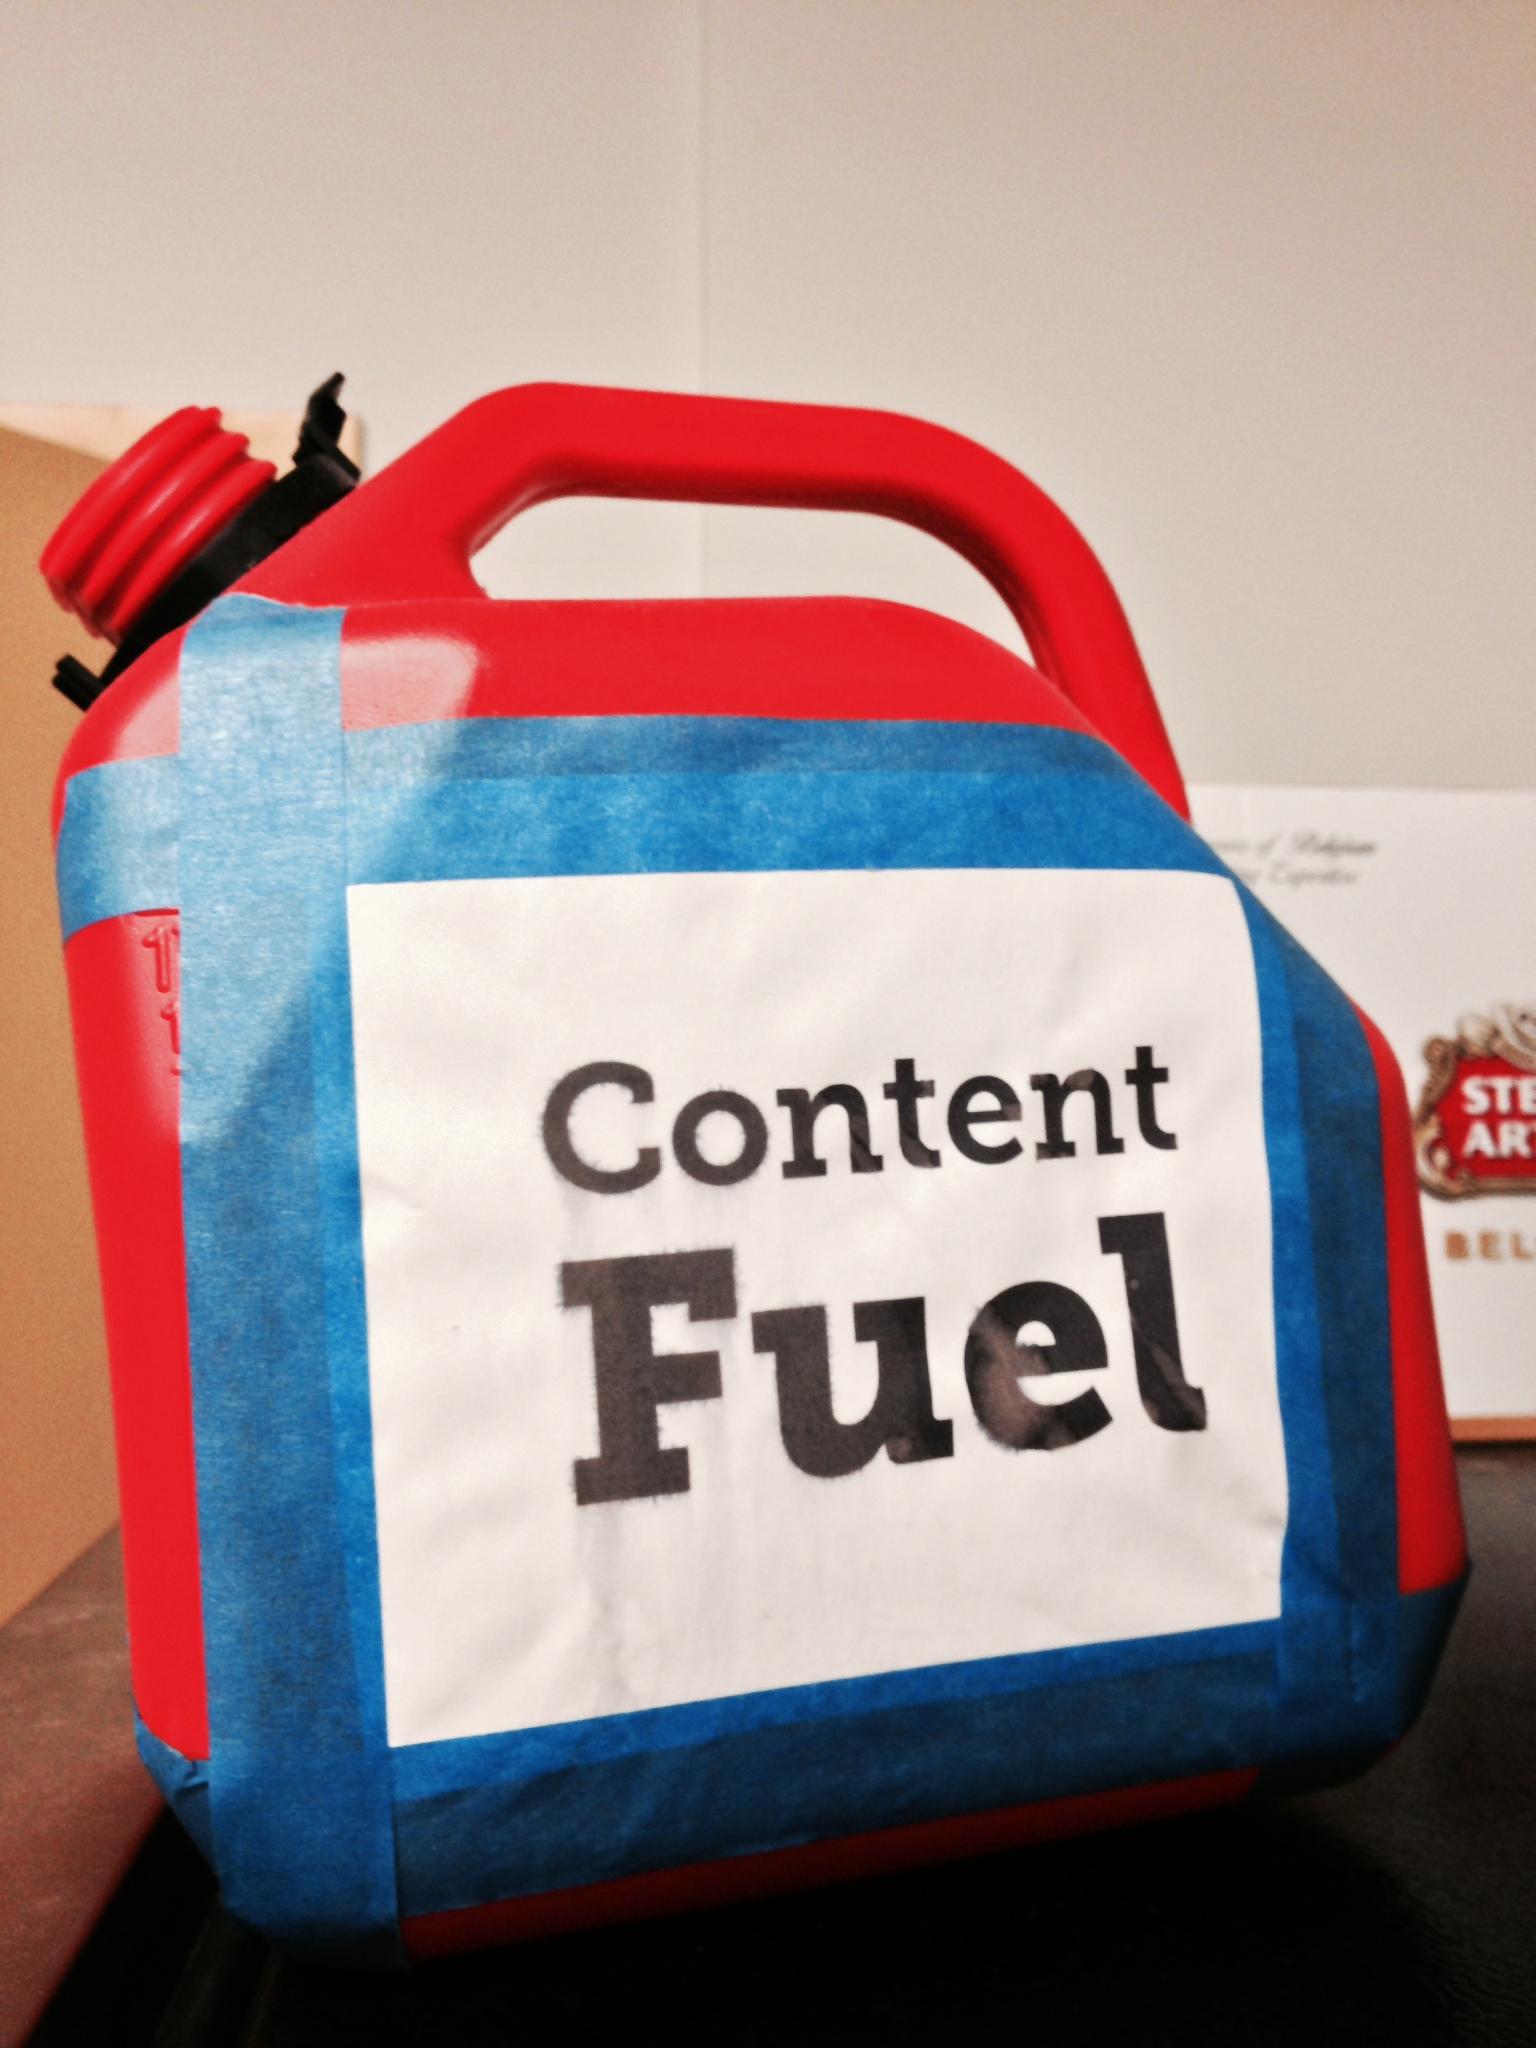 Content Fuel